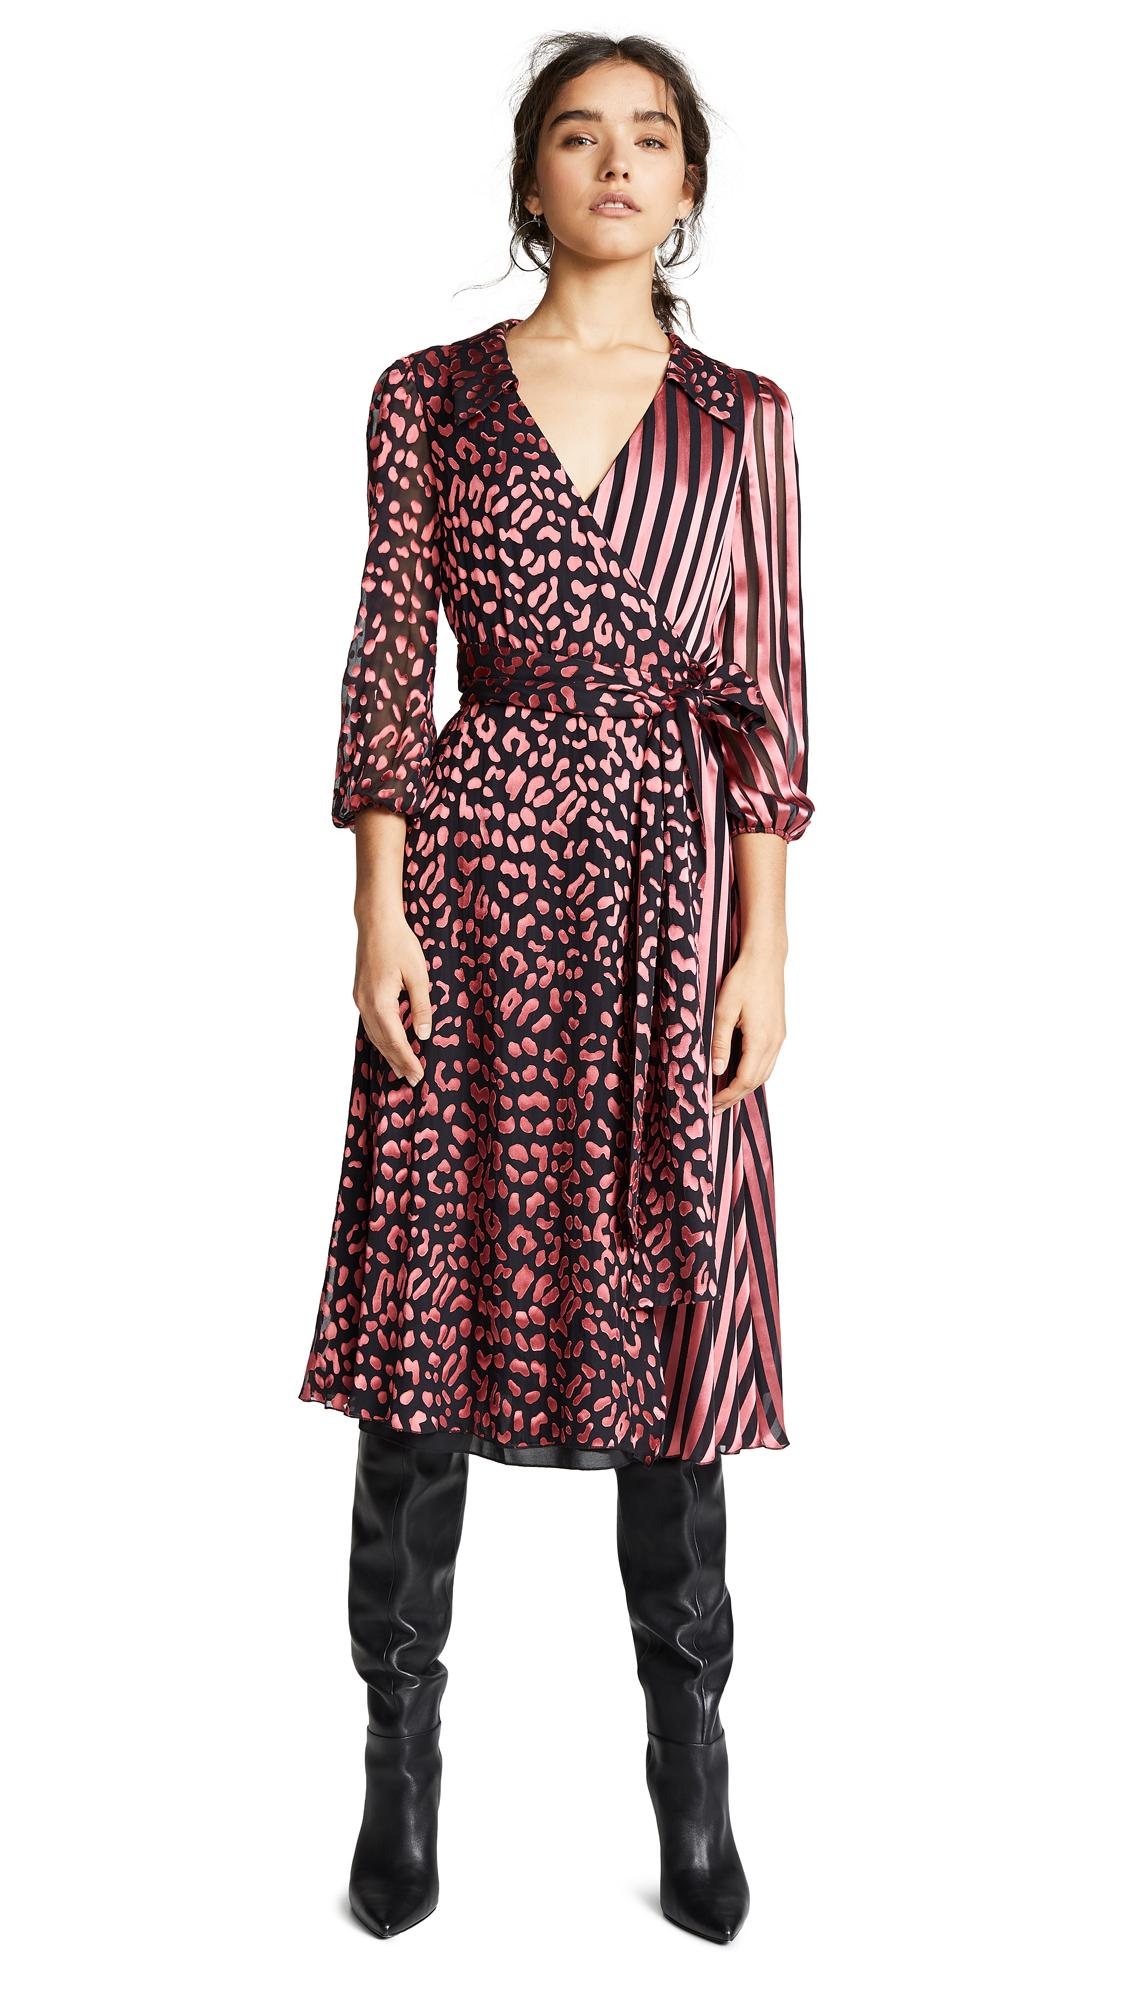 alice + olivia Abigail Wrap Dress